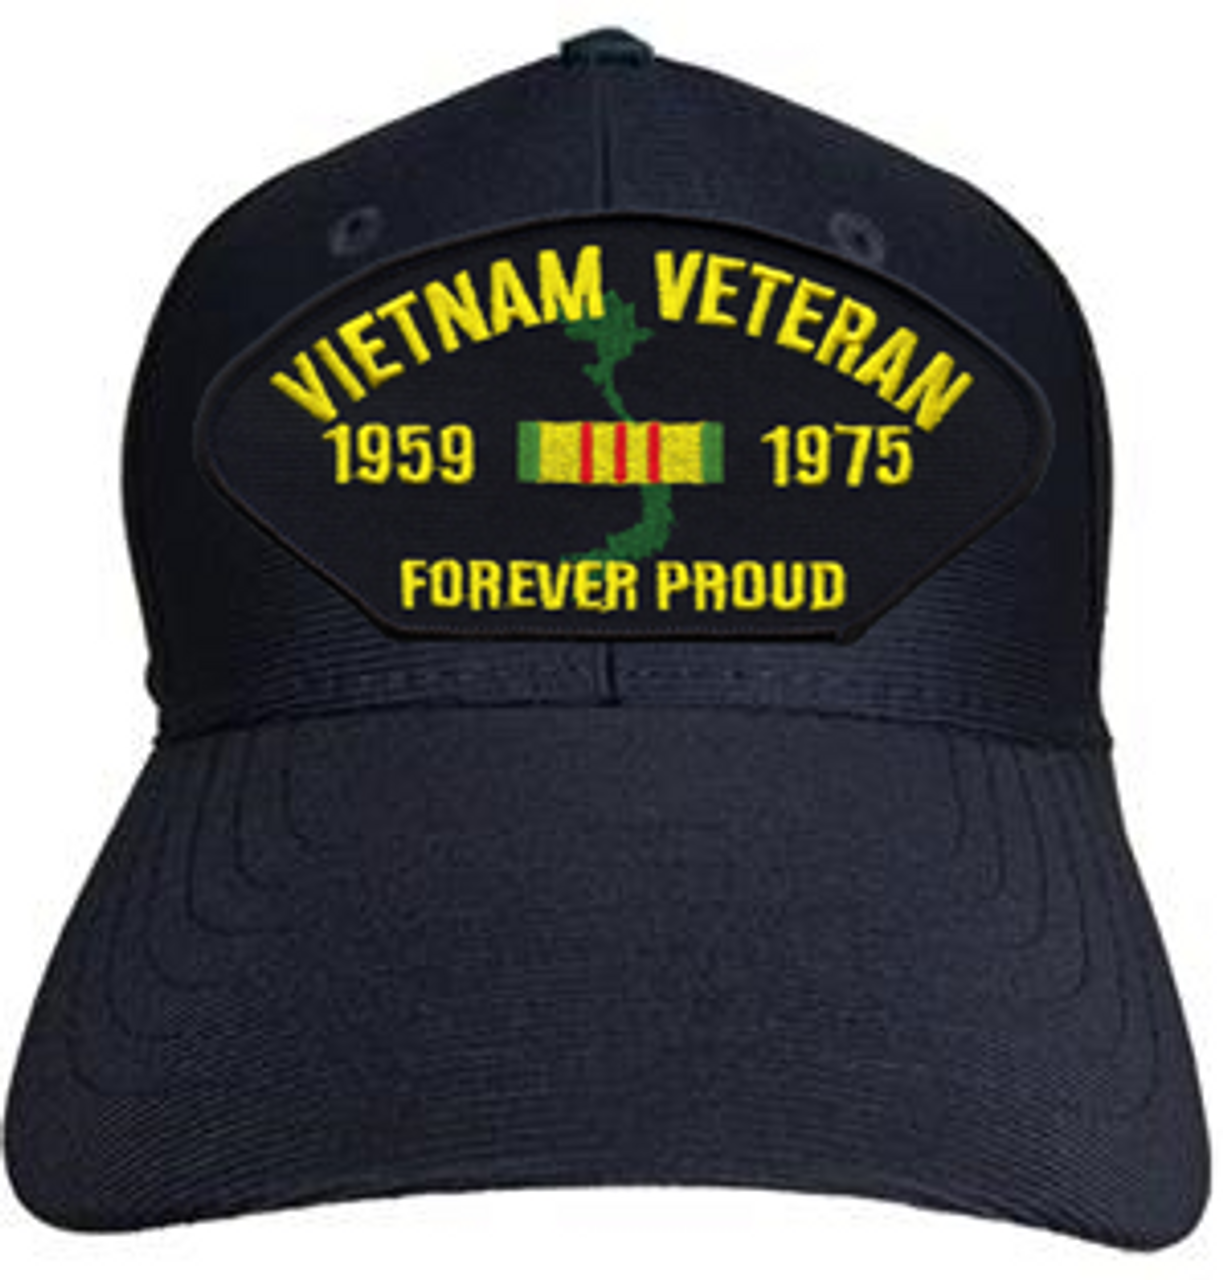 BLACK VIETNAM VETERAN 1959-1975 HAT Veteran Owned Business